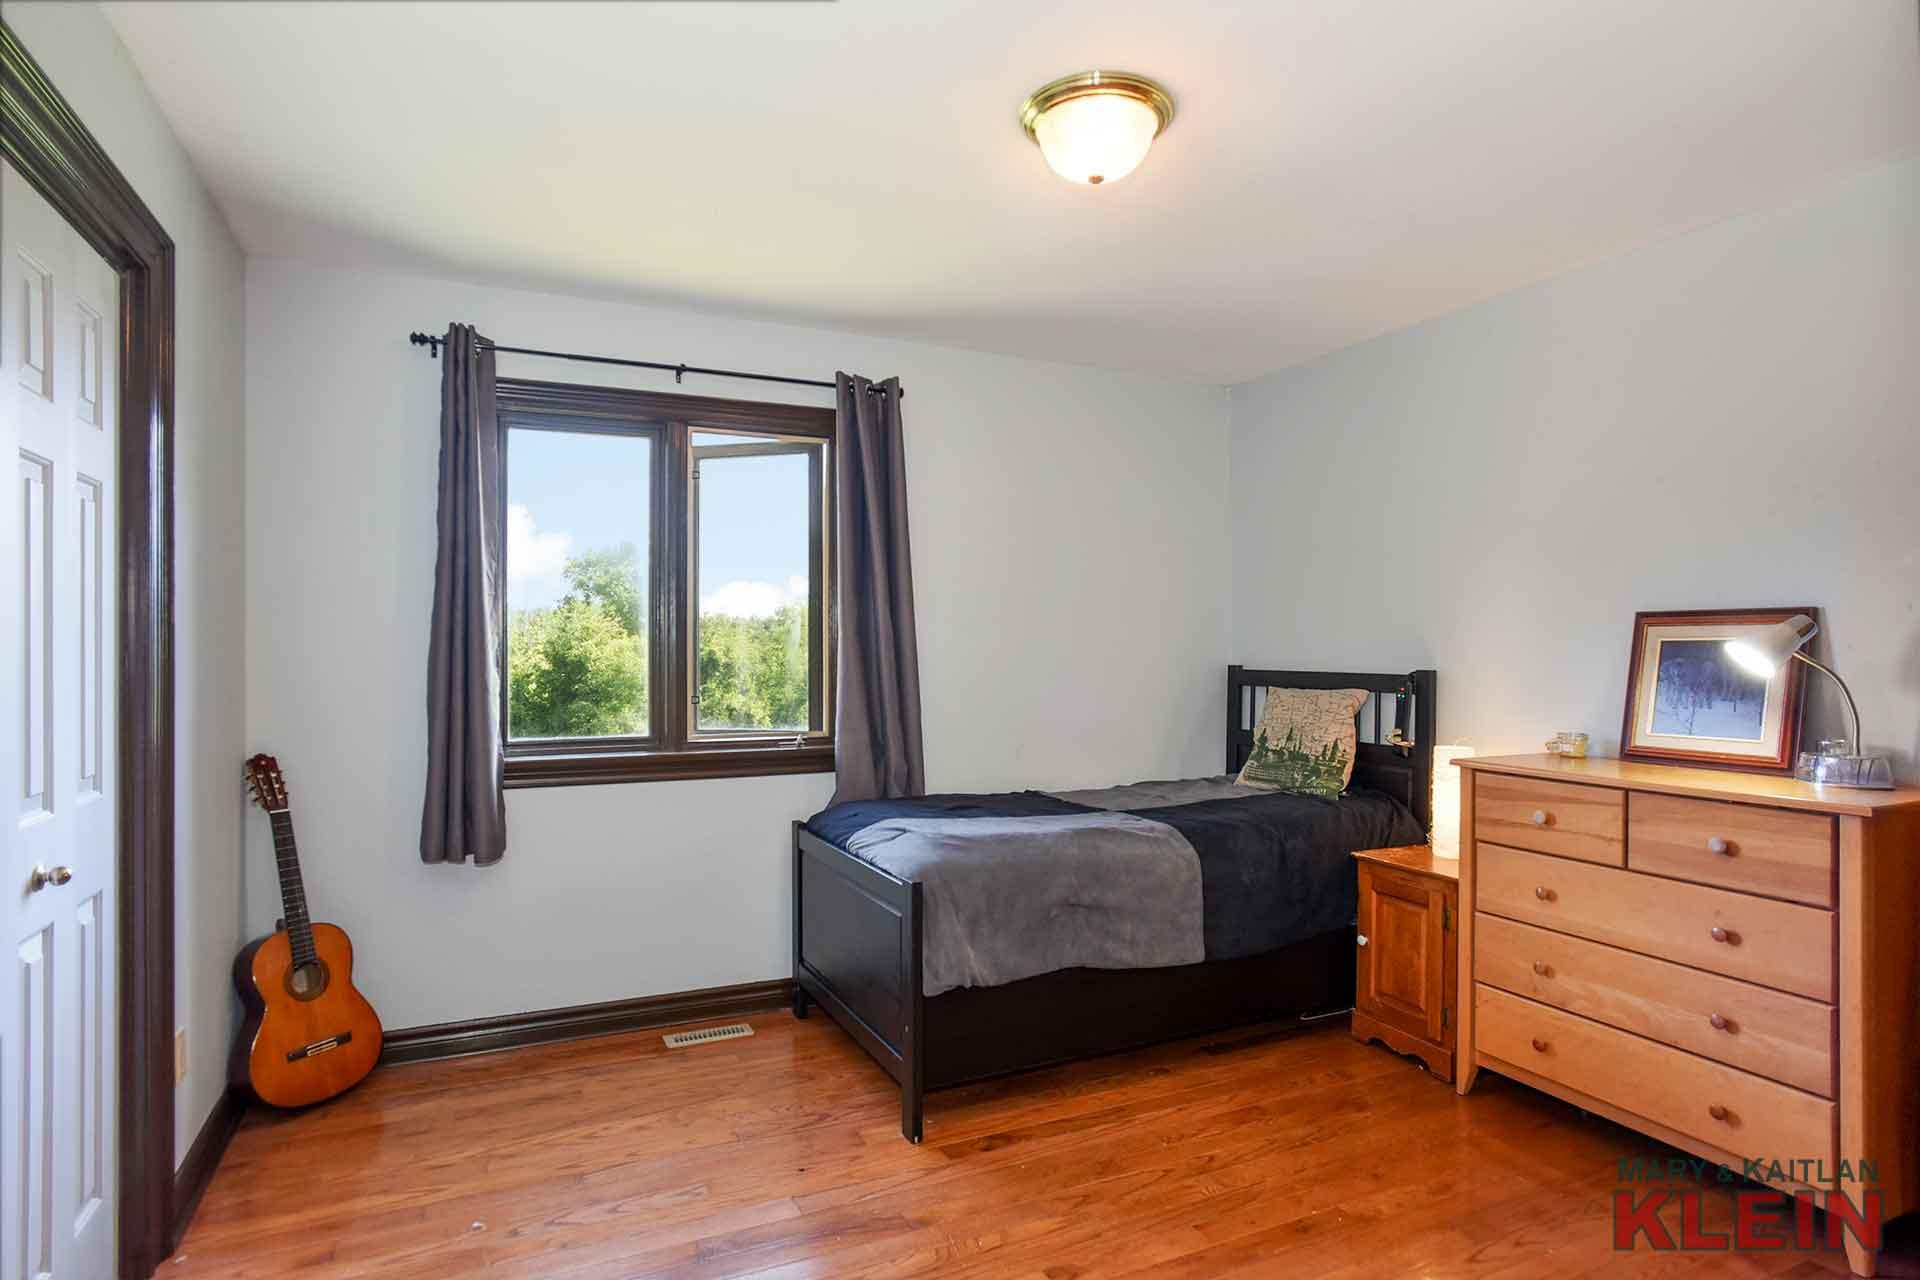 Bedroom 2, closet